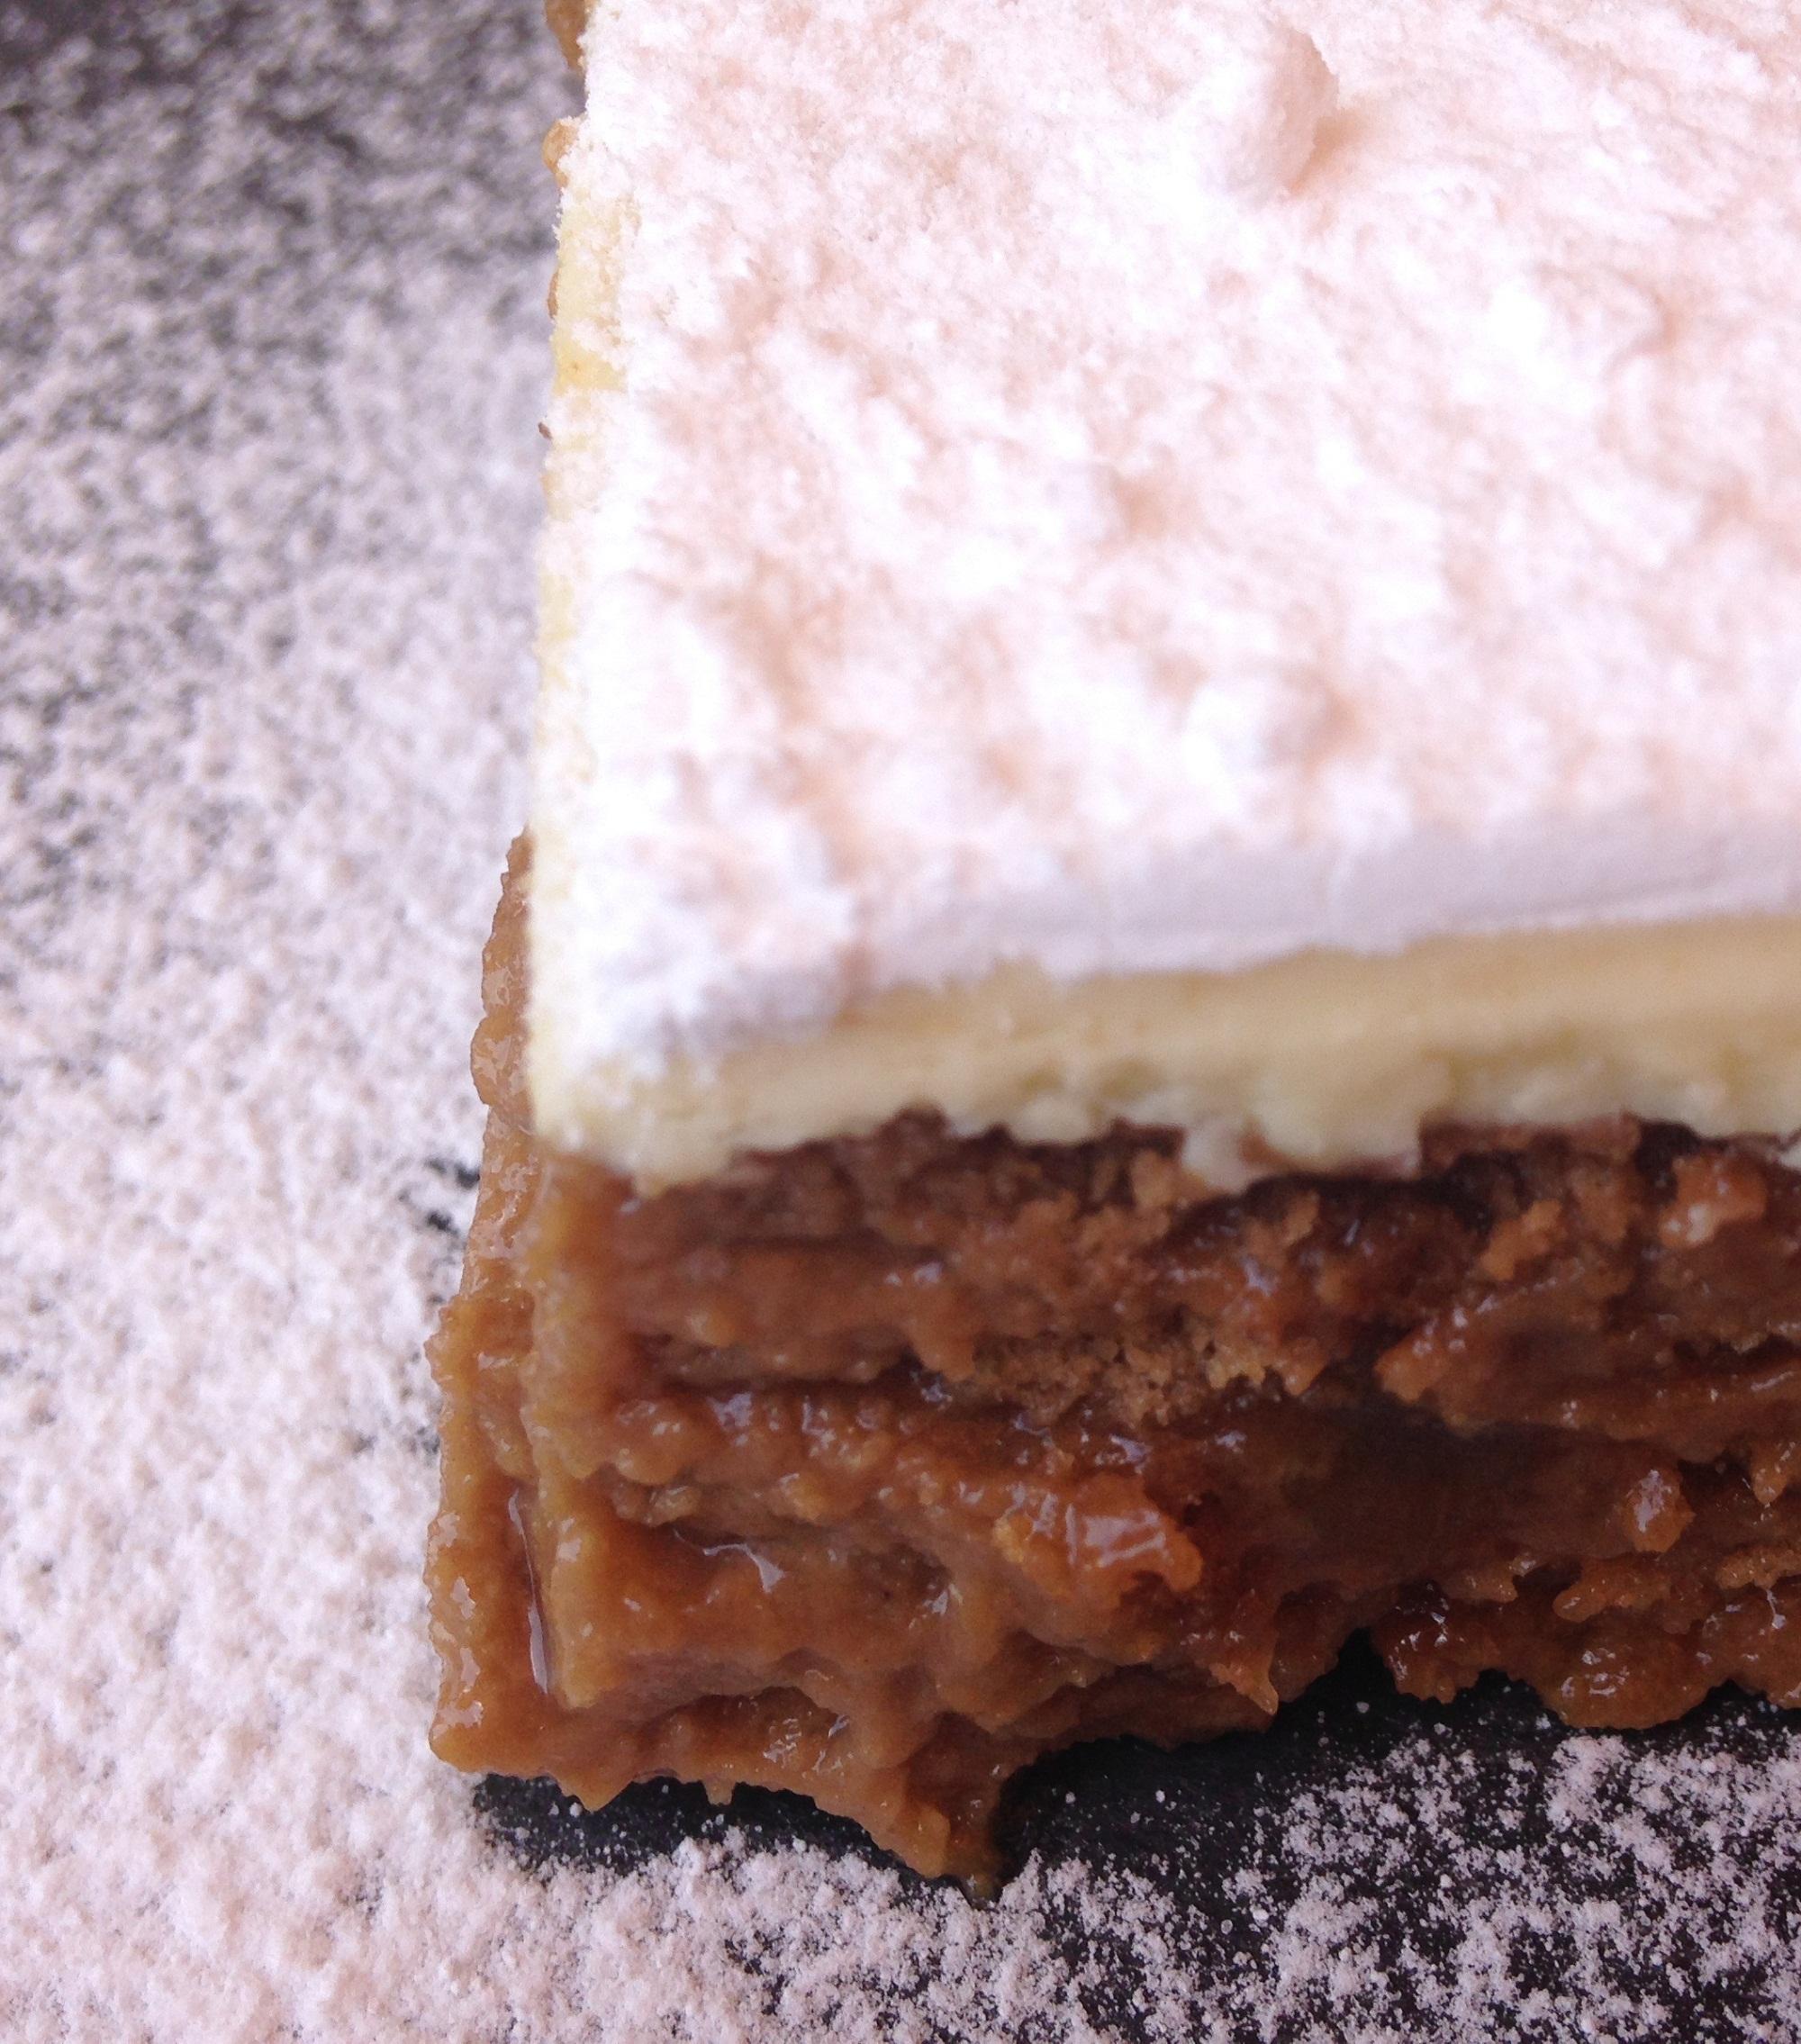 Haz una tarta con tus mermeladas. Tarta de galletas y mermelada de albaricoque.